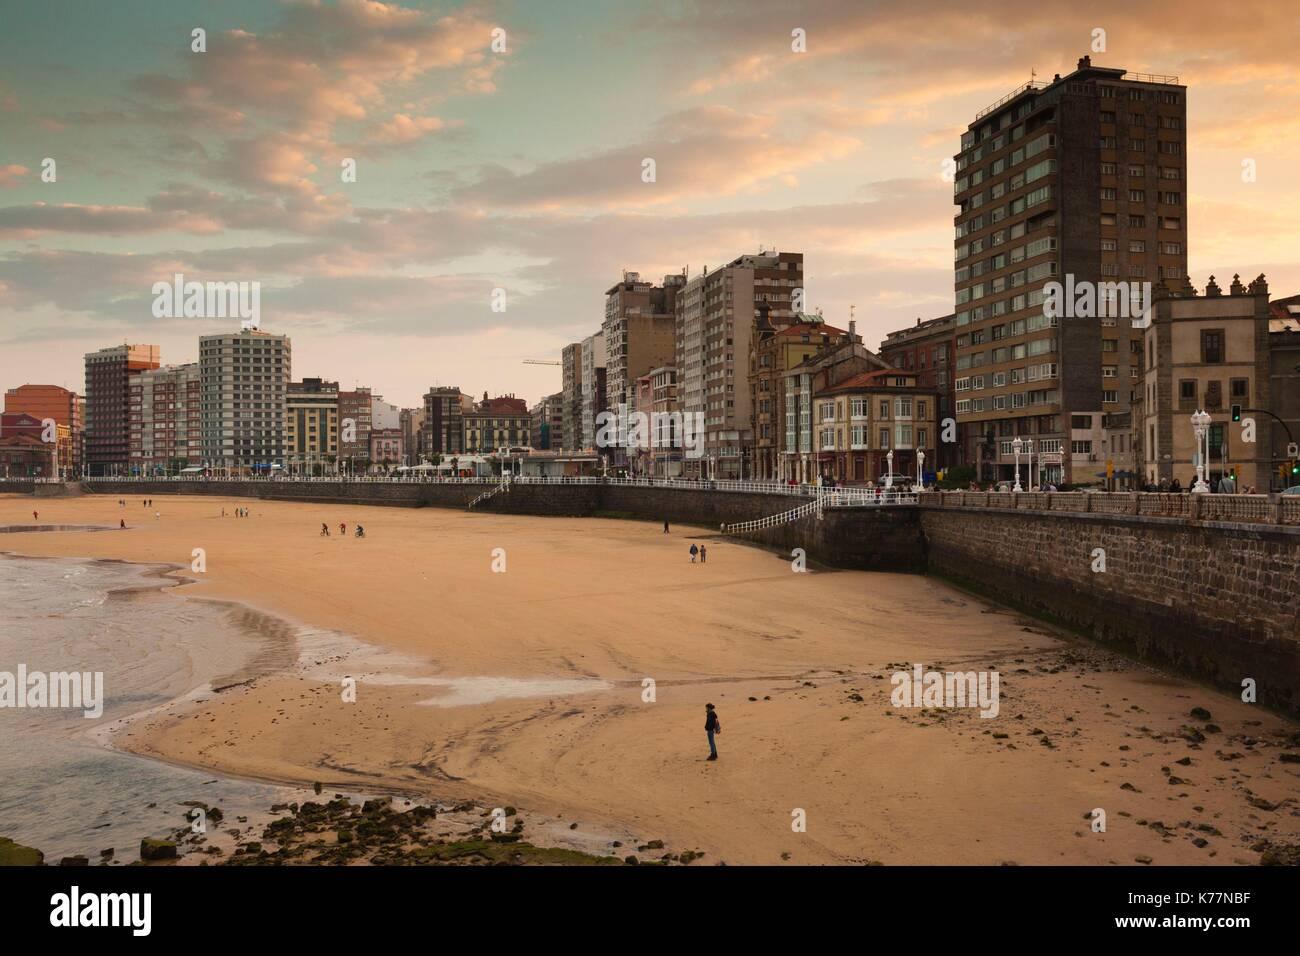 Spanien, Asturien, Asturias Province, Gijon, Gebäude entlang der Playa de San Lorenzo Strand, am späten Stockbild